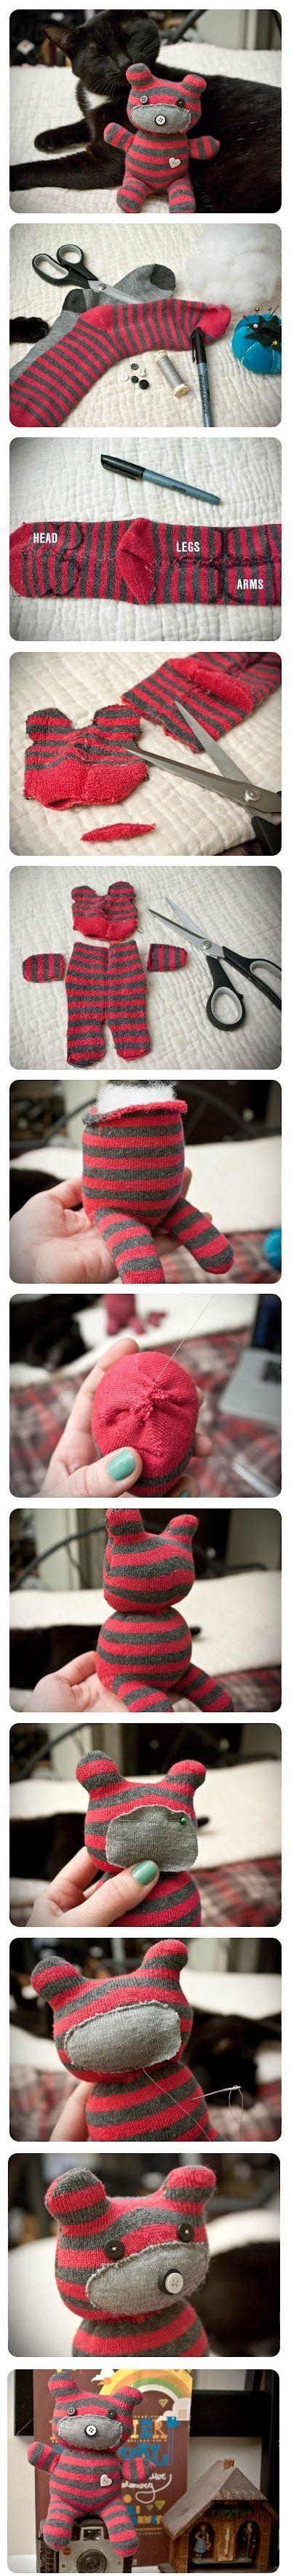 DIY Cute Little Teddy Bear.  Cuter cat!  :D by vernmh